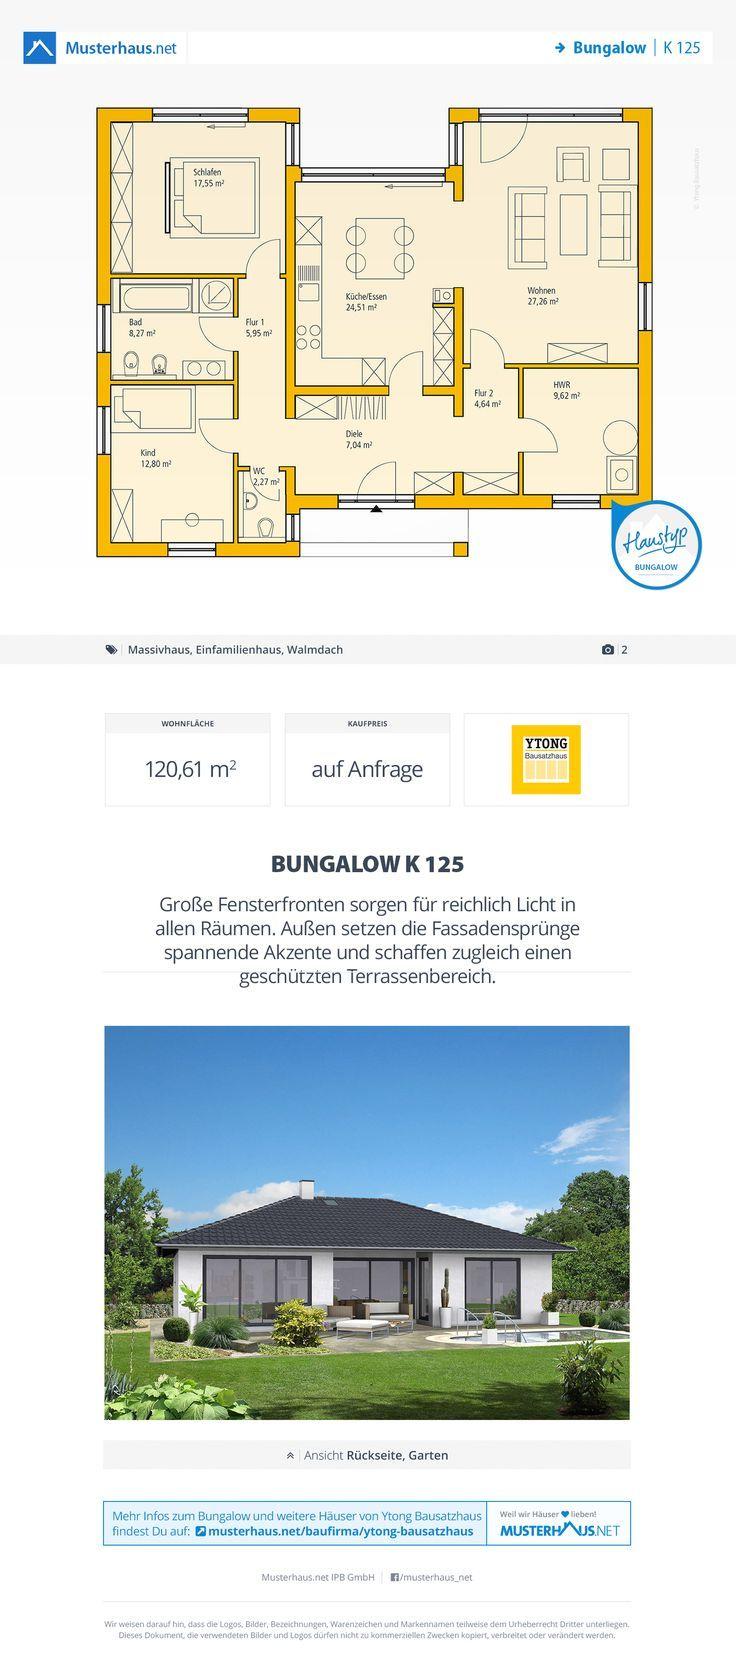 Bungalow Grundriss, 121 m², offene Küche Bungalow